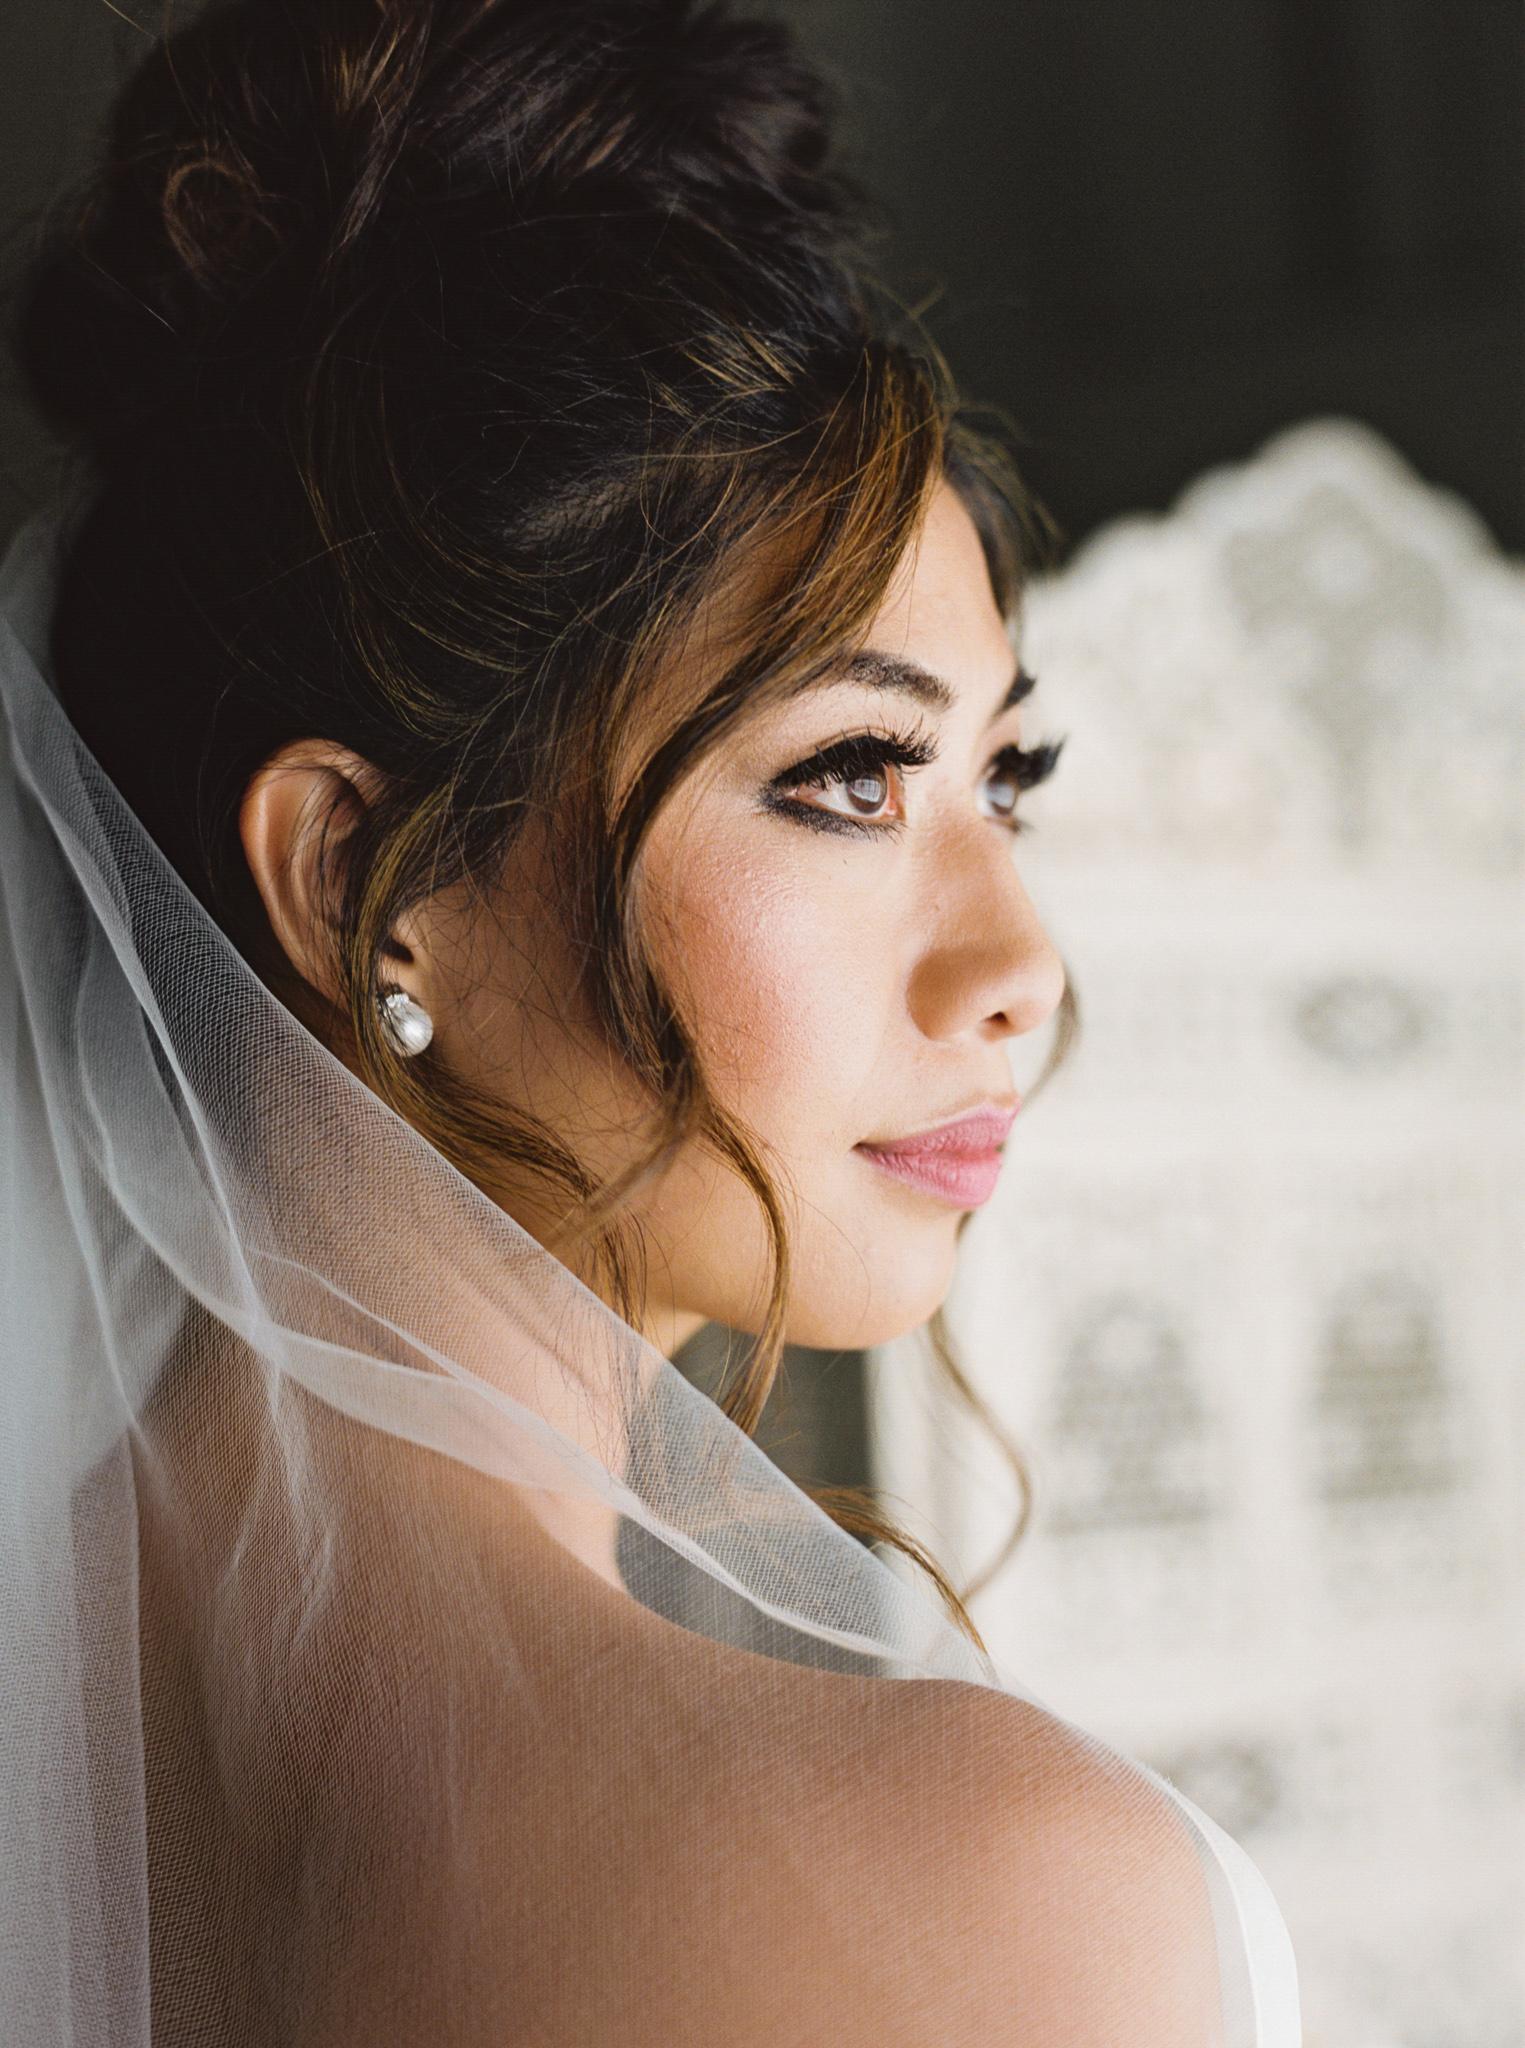 017OutliveCreative_Travel_Photographer_Videographer_Lewis&Clark_Oregon_Elegant_BlackTie_Destination_Wedding.jpg